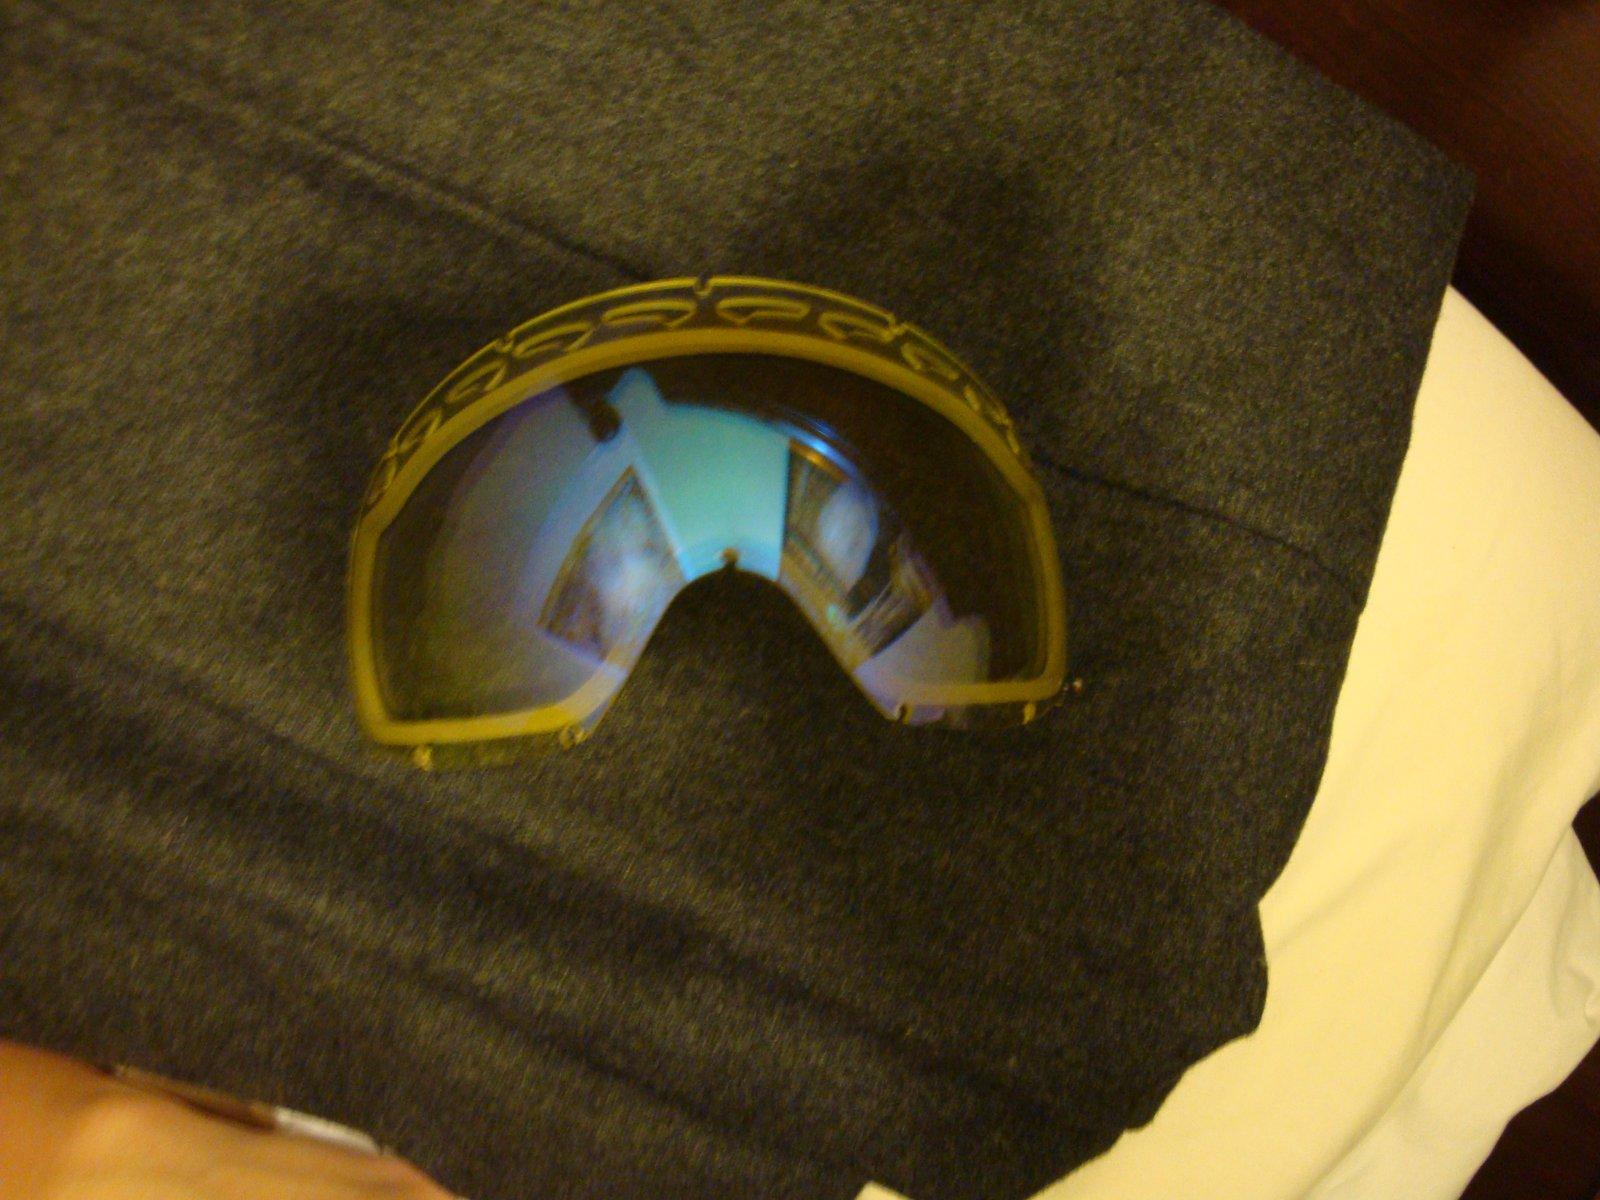 Crowbar lens